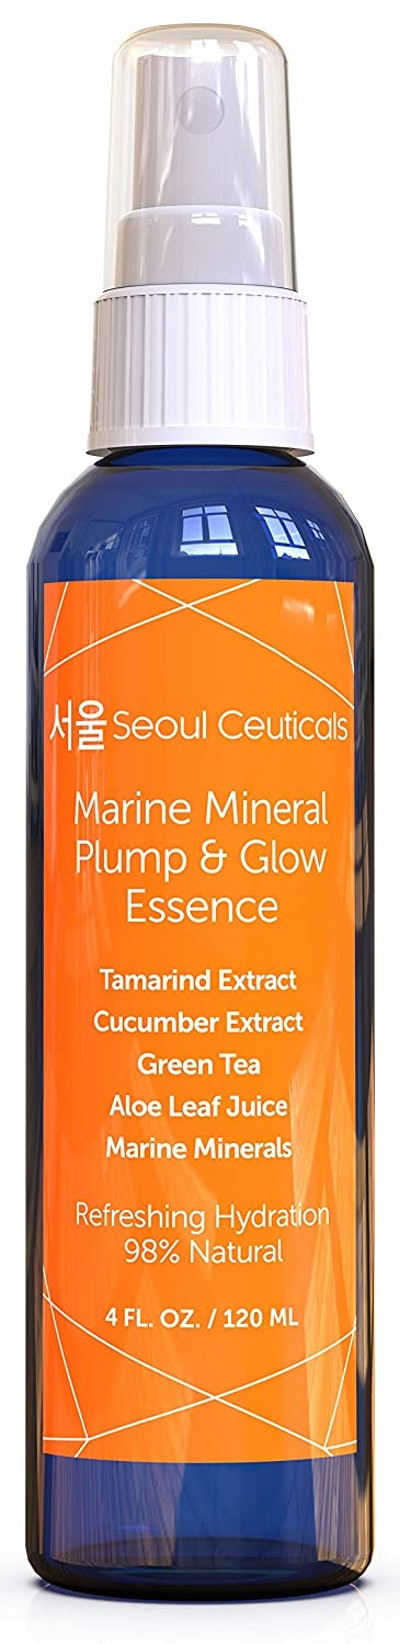 Seoul Ceuticals Marine Mineral Plump & Glow Essence (4 Oz)